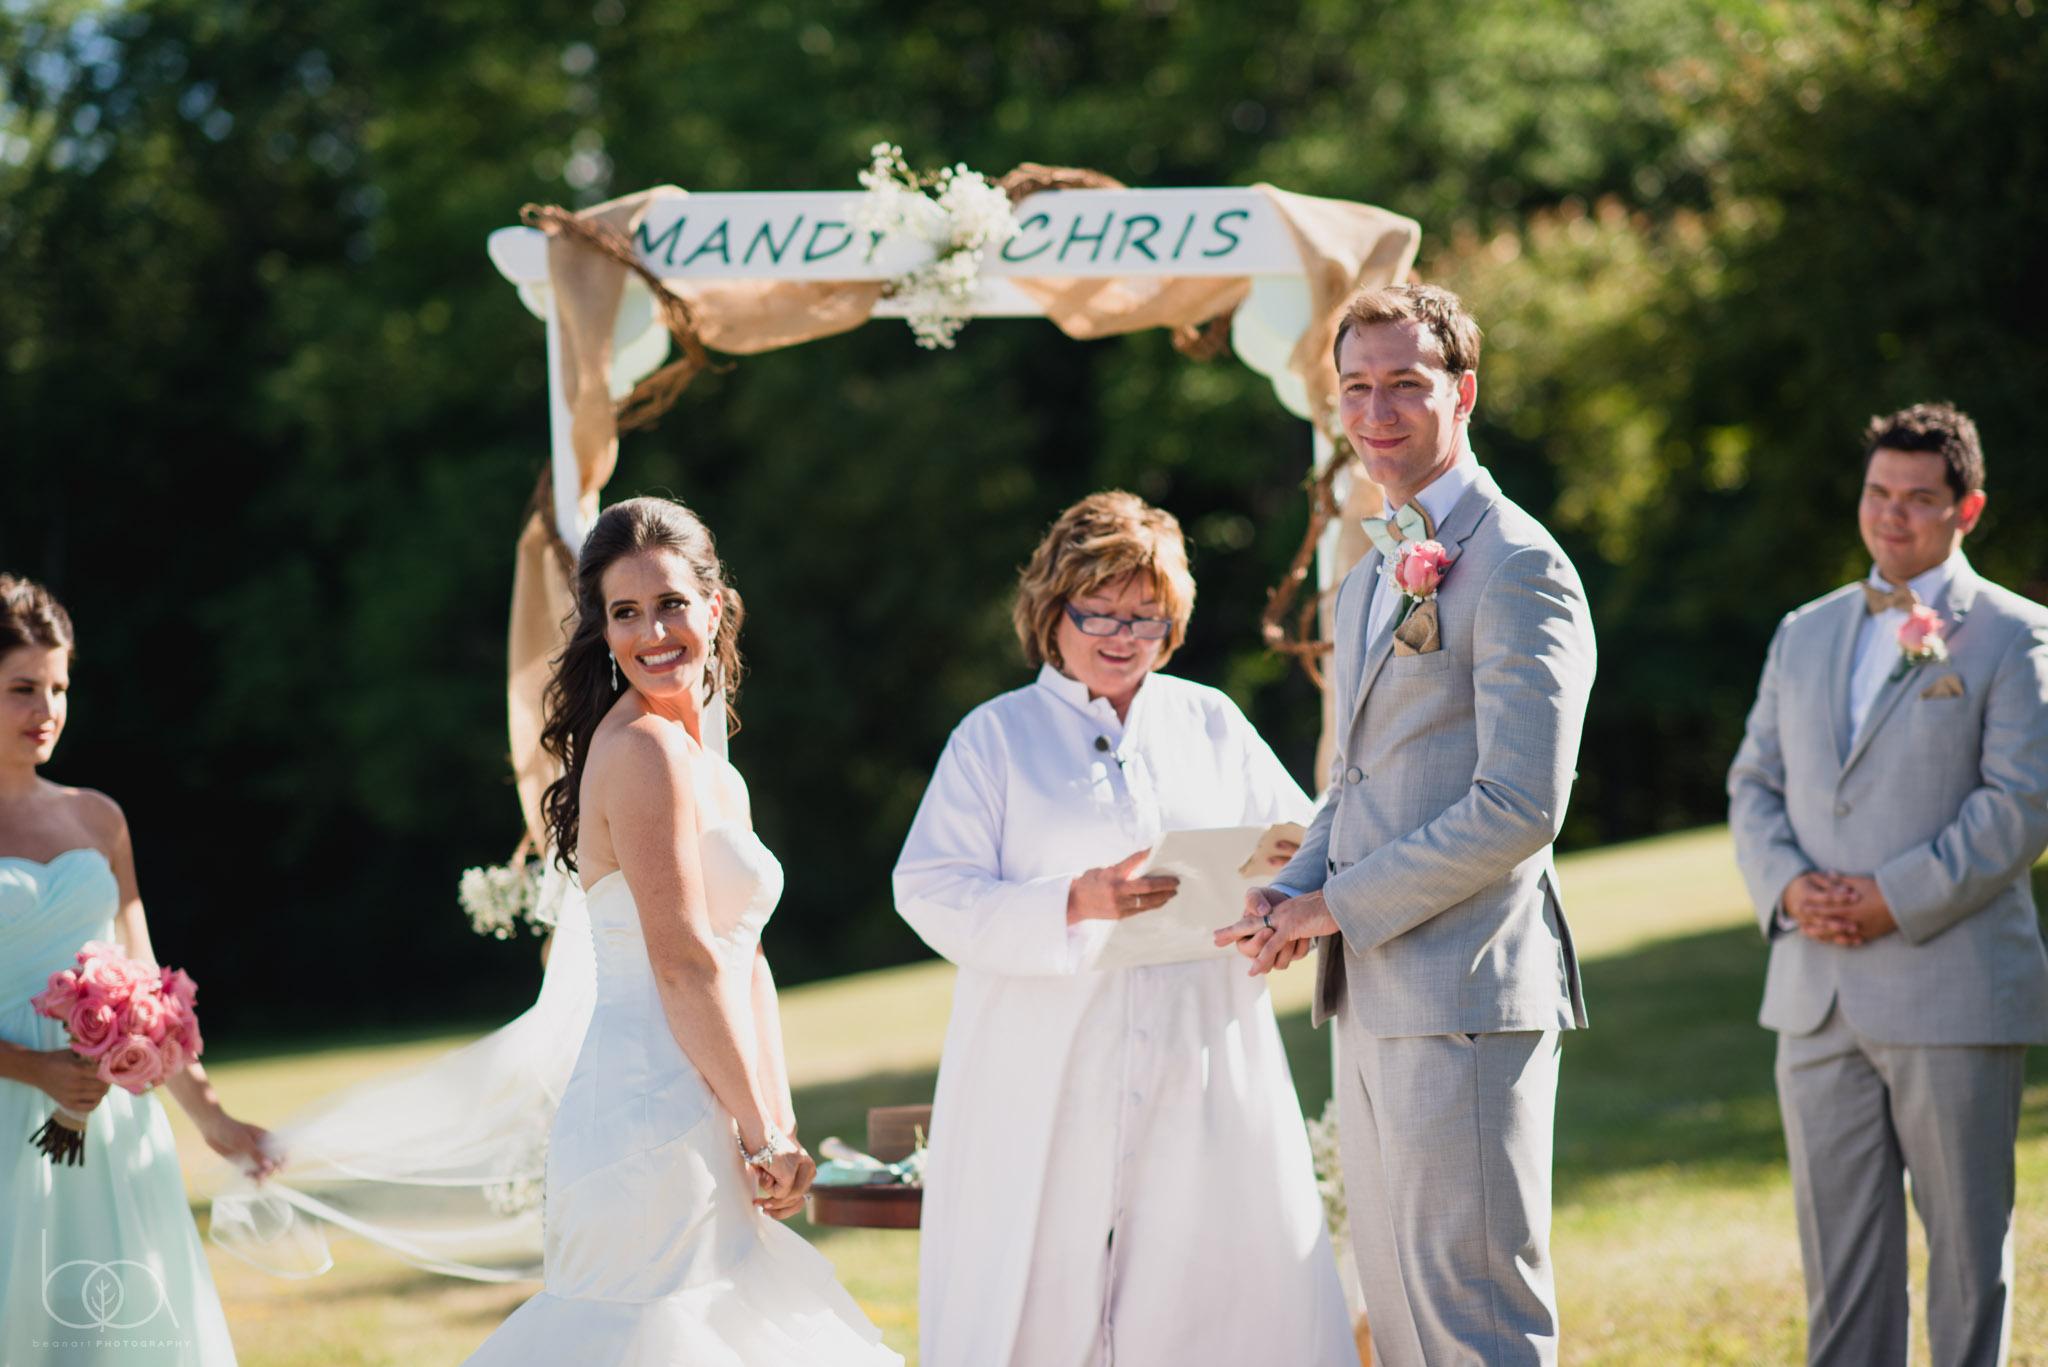 Chris + Mandy-50.jpg